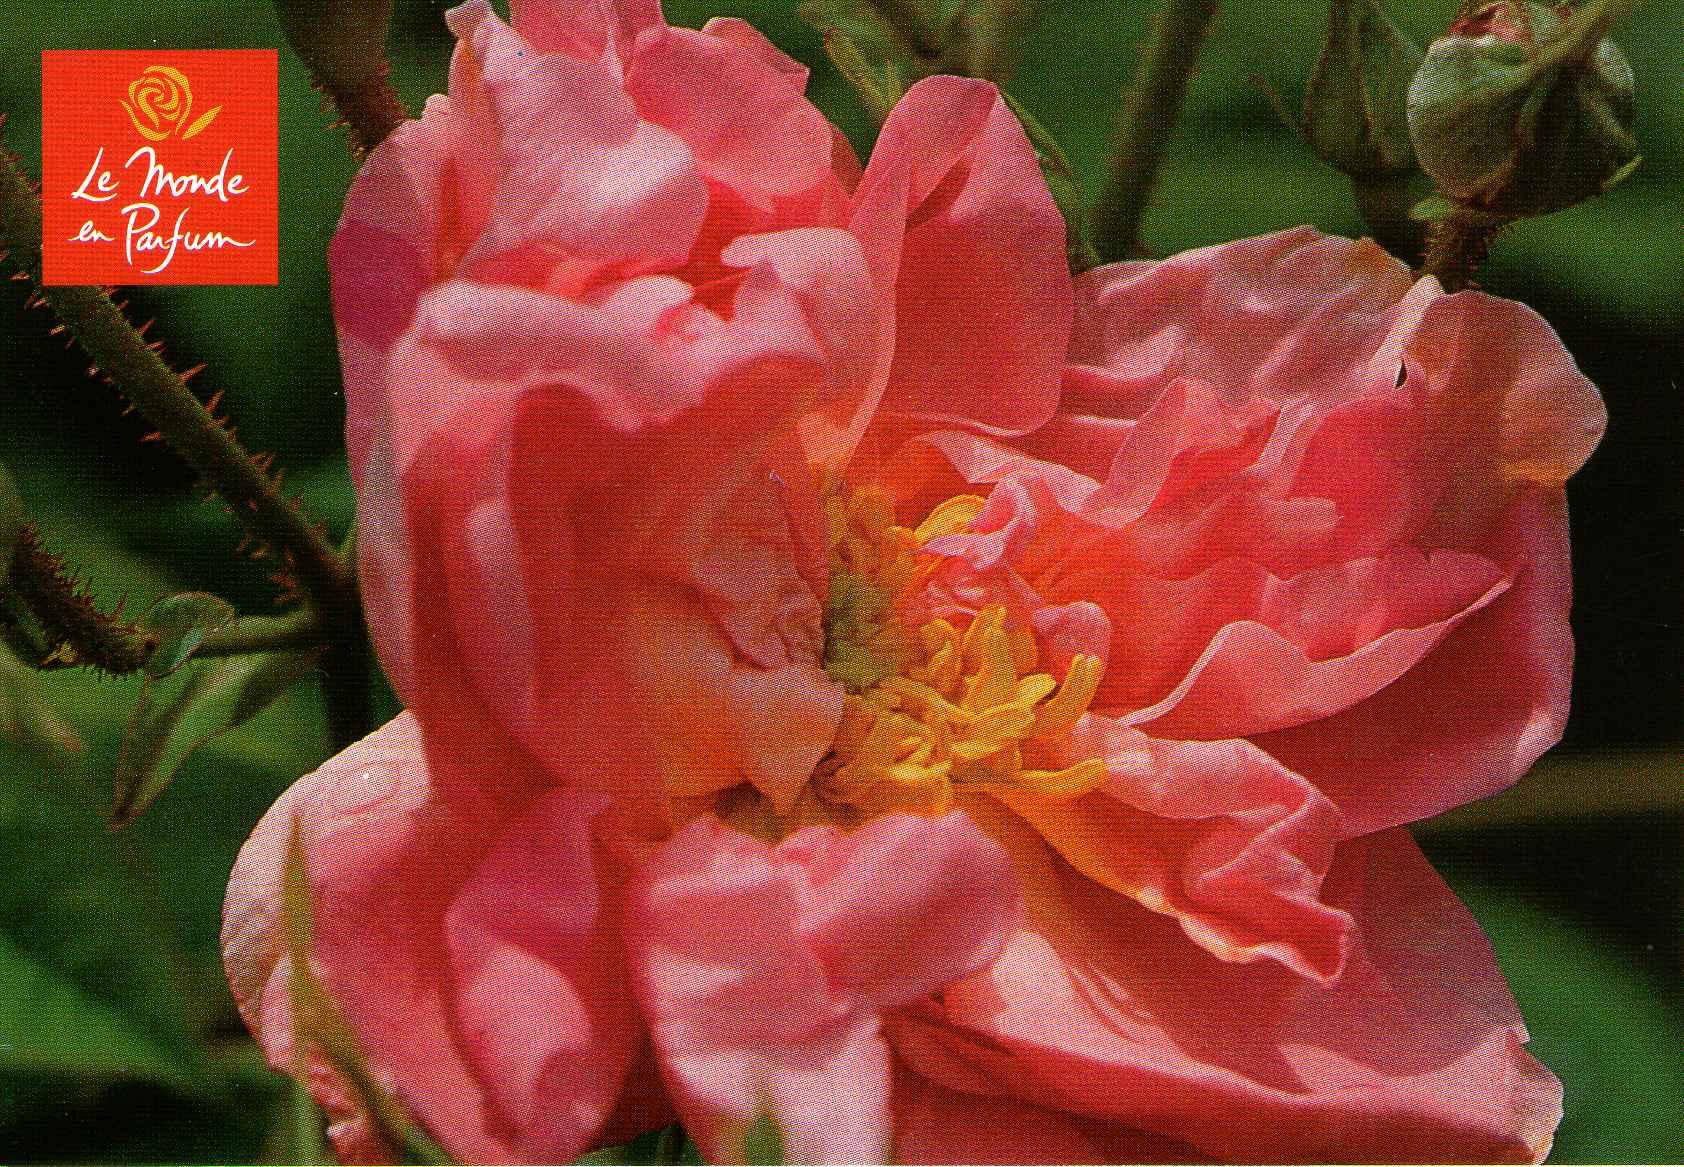 http://ekladata.com/ZXlkq_OlenFFN6WGcr1-Pz7UvFw/Rose-centifolia-Le-Monde-en-Parfum.jpg